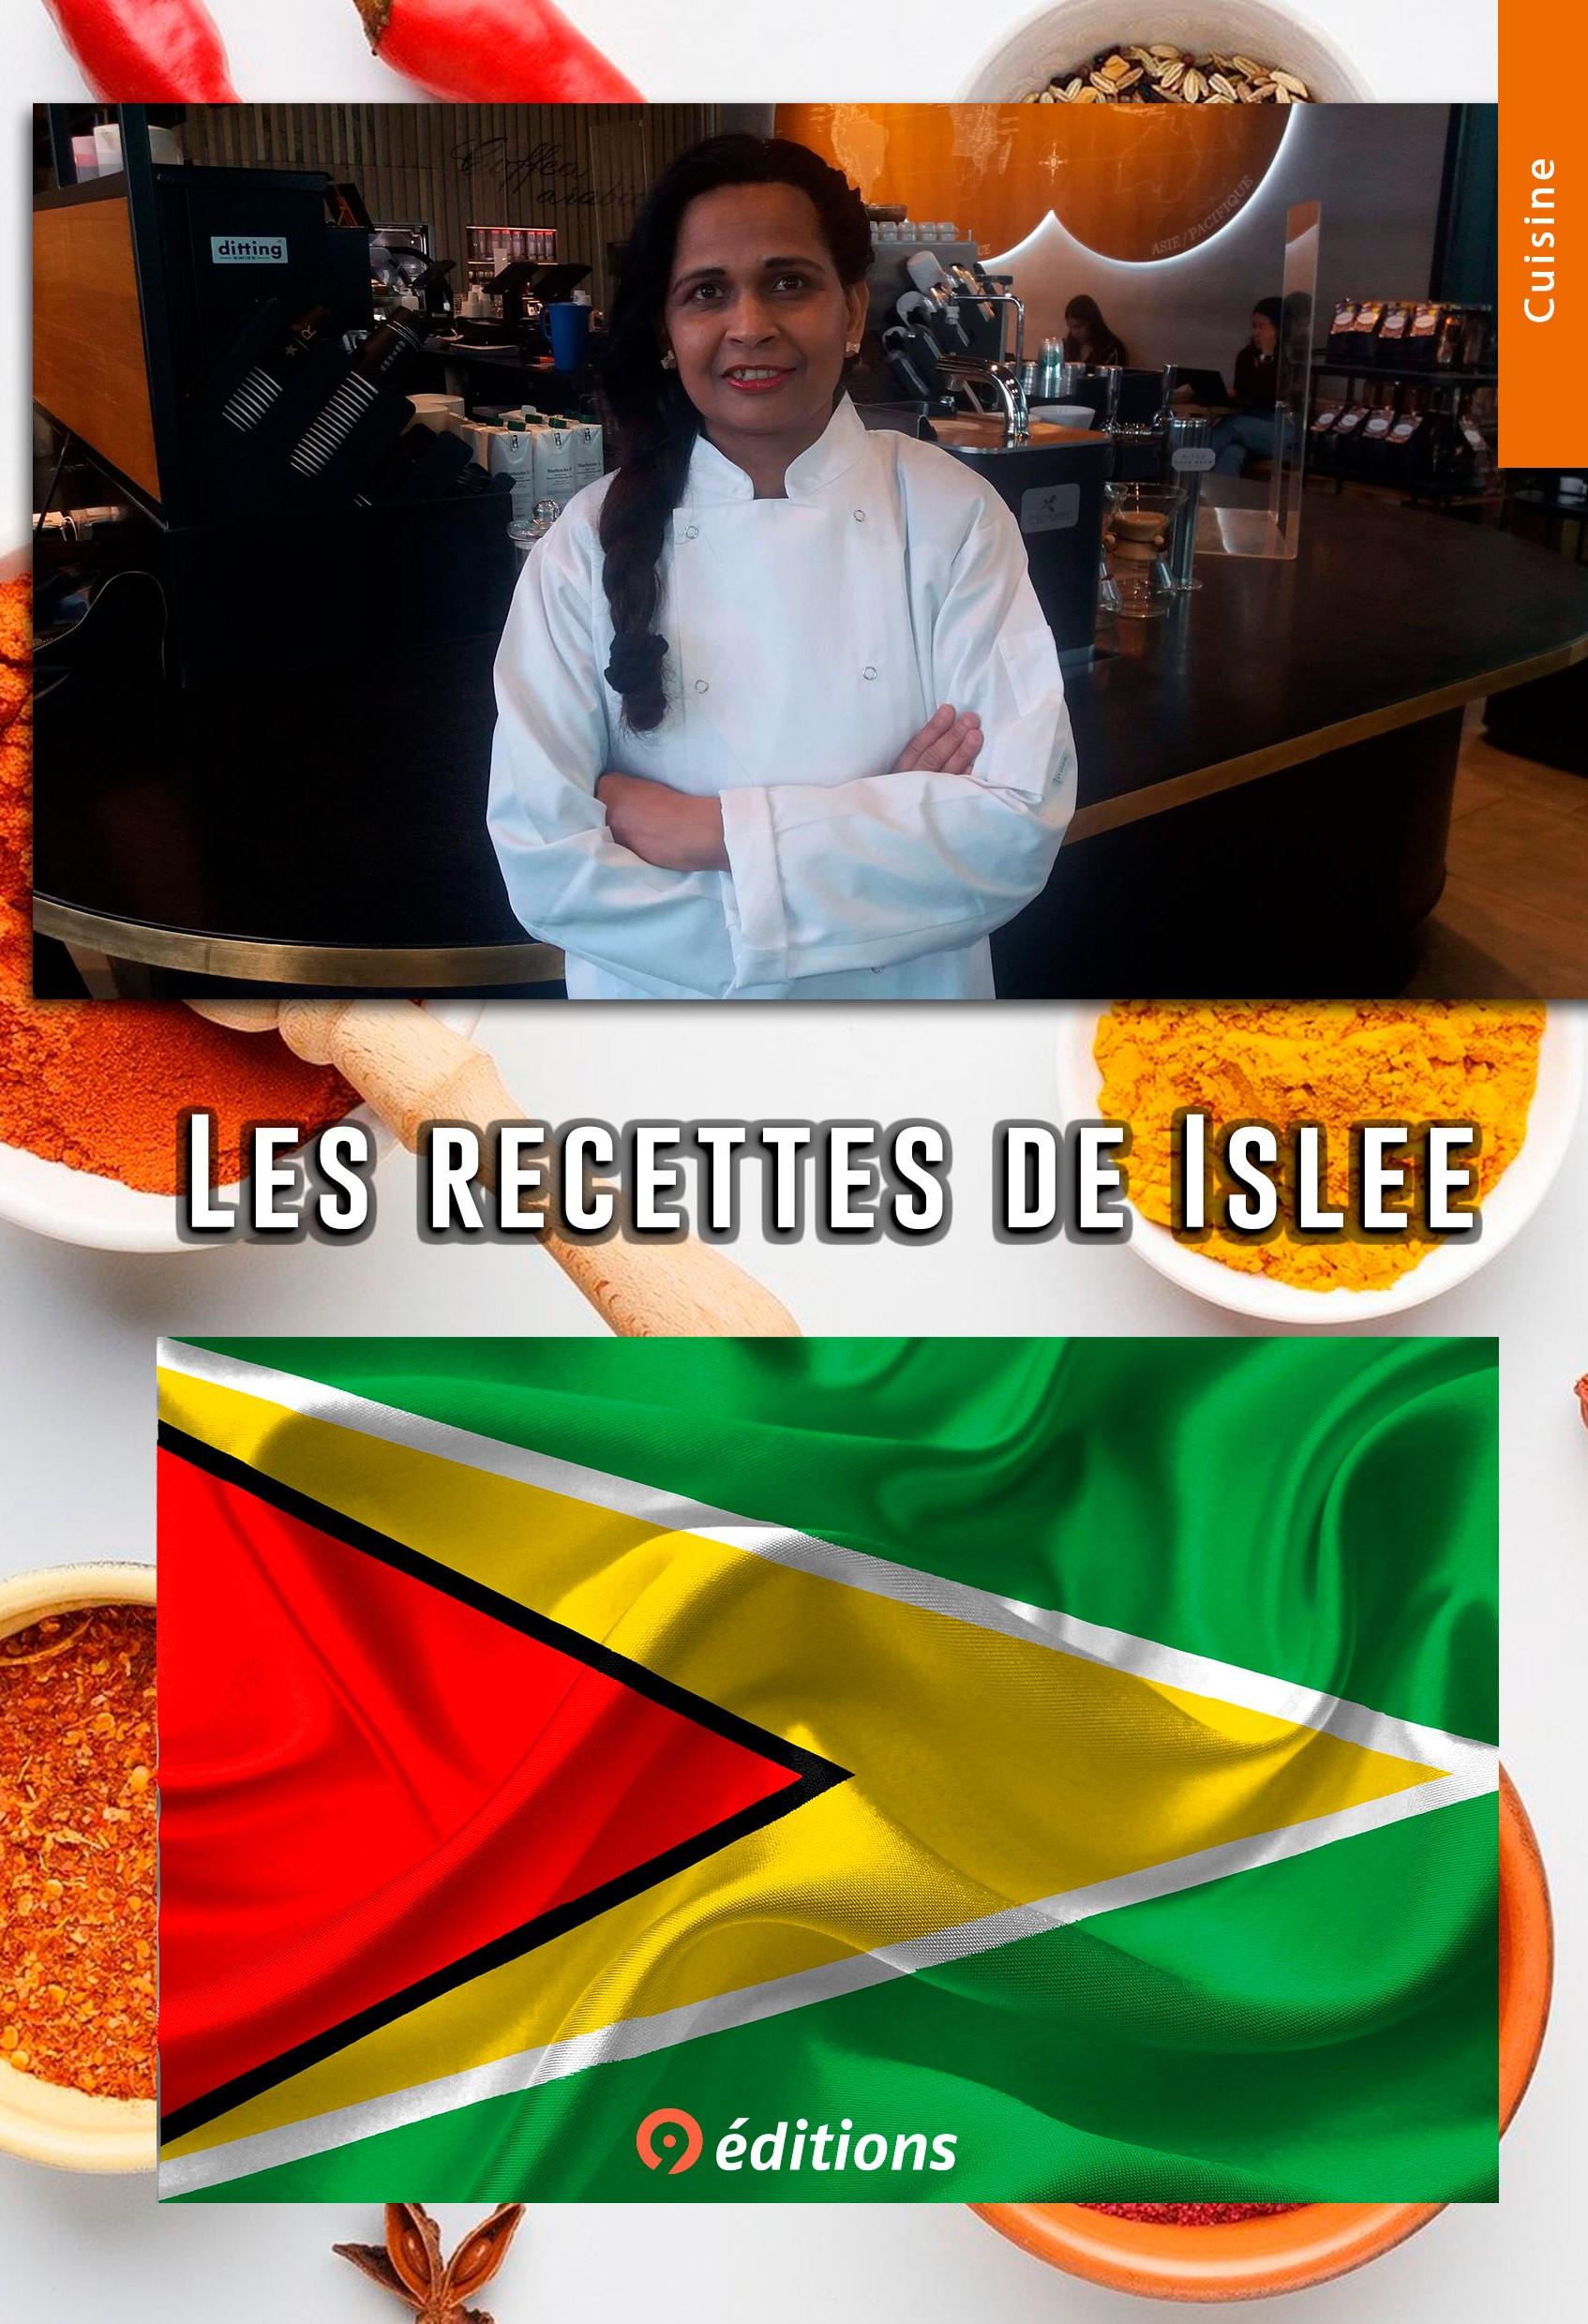 Les recettes de Islee